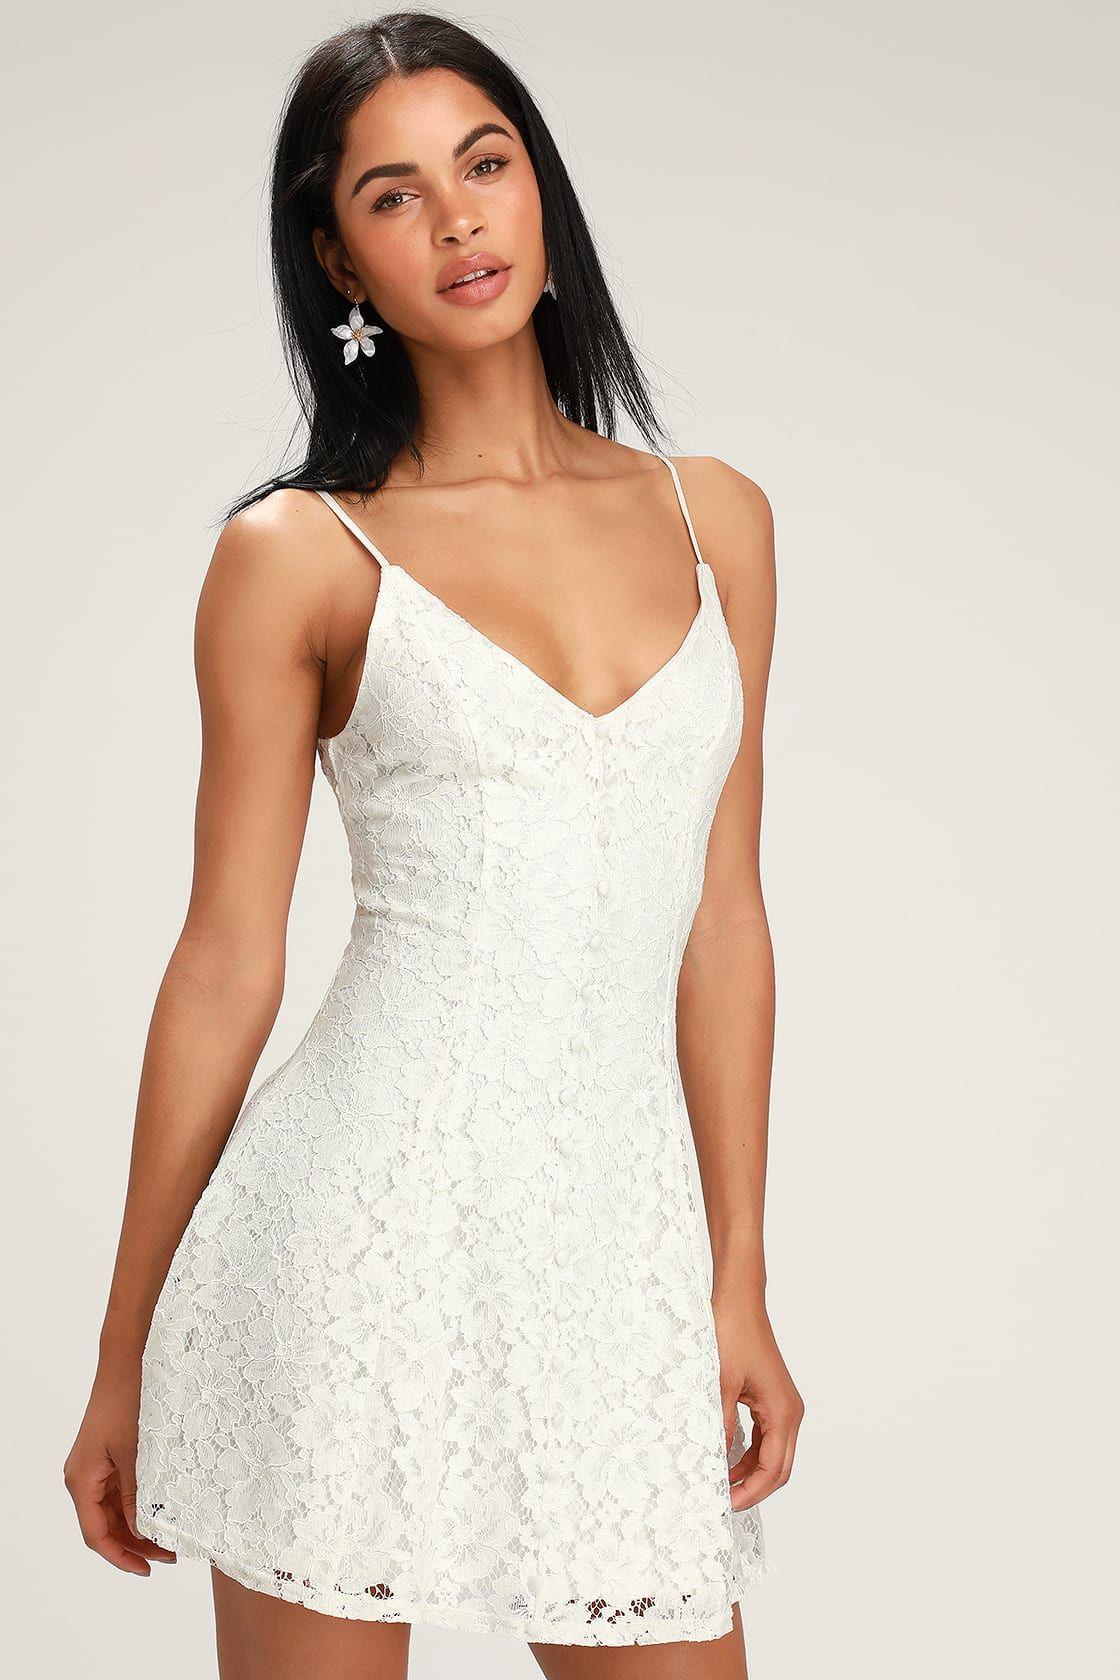 Easy Love White Lace Skater Dress White Lace Skater Dress White Dresses Graduation White Skater Dresses [ 1680 x 1120 Pixel ]